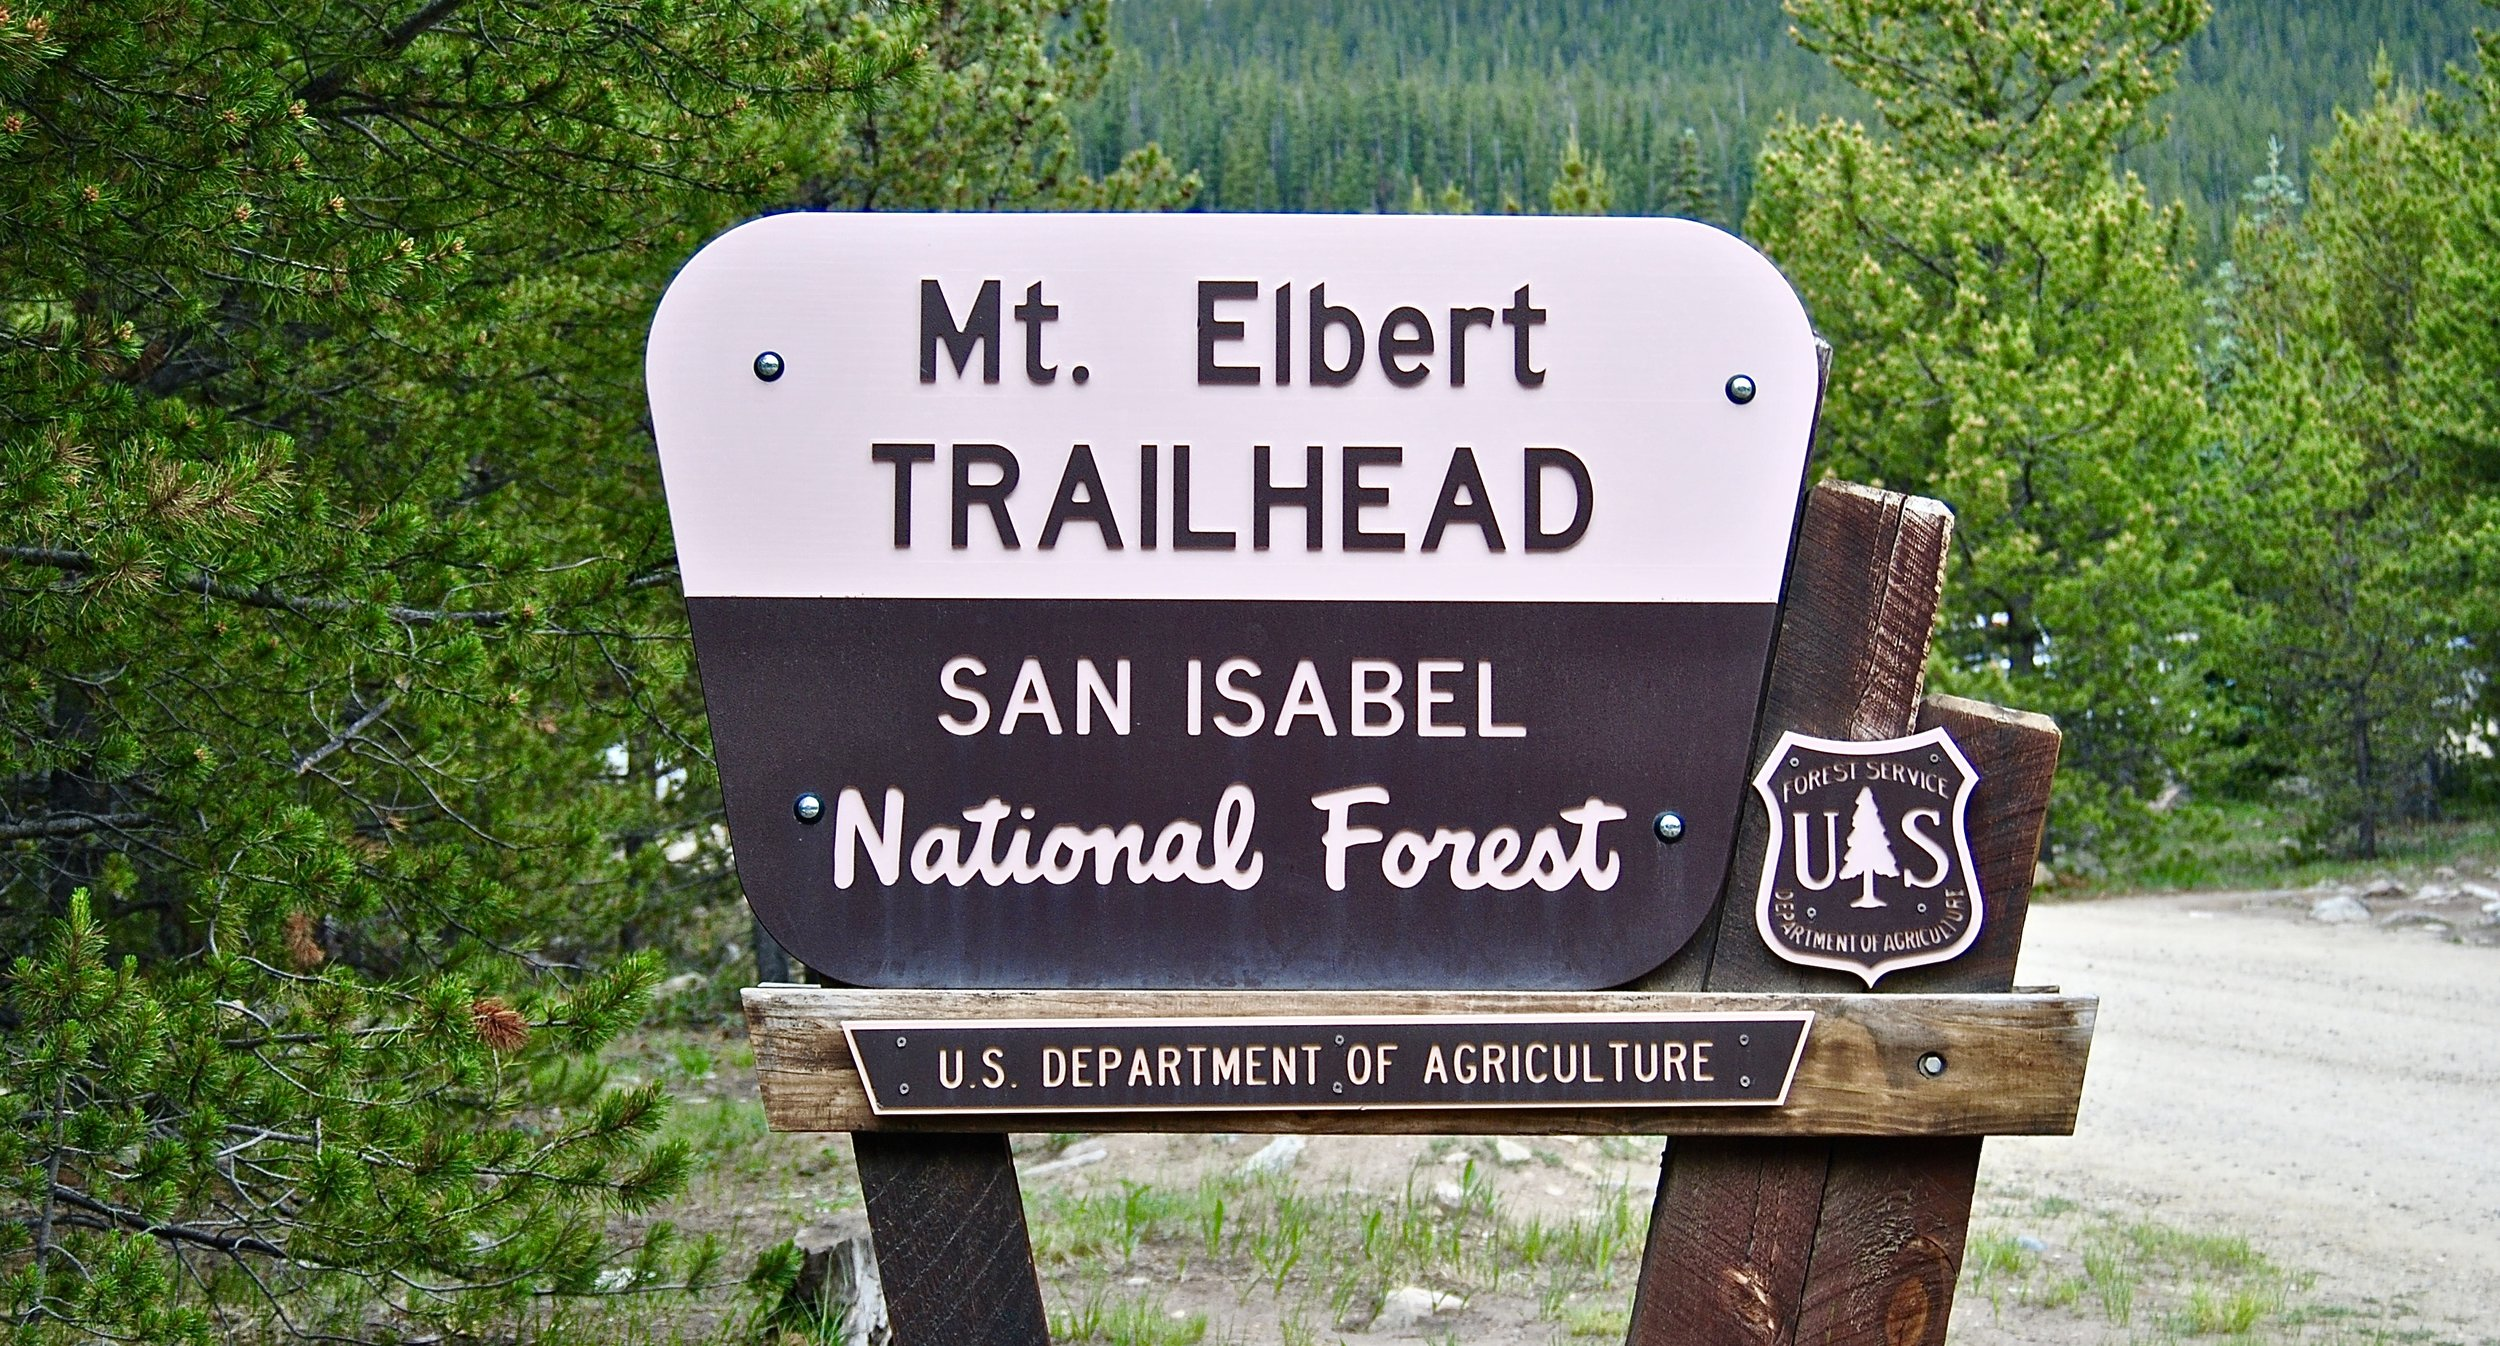 The trailhead is well-marked, unlike trailheads on the east coast ...